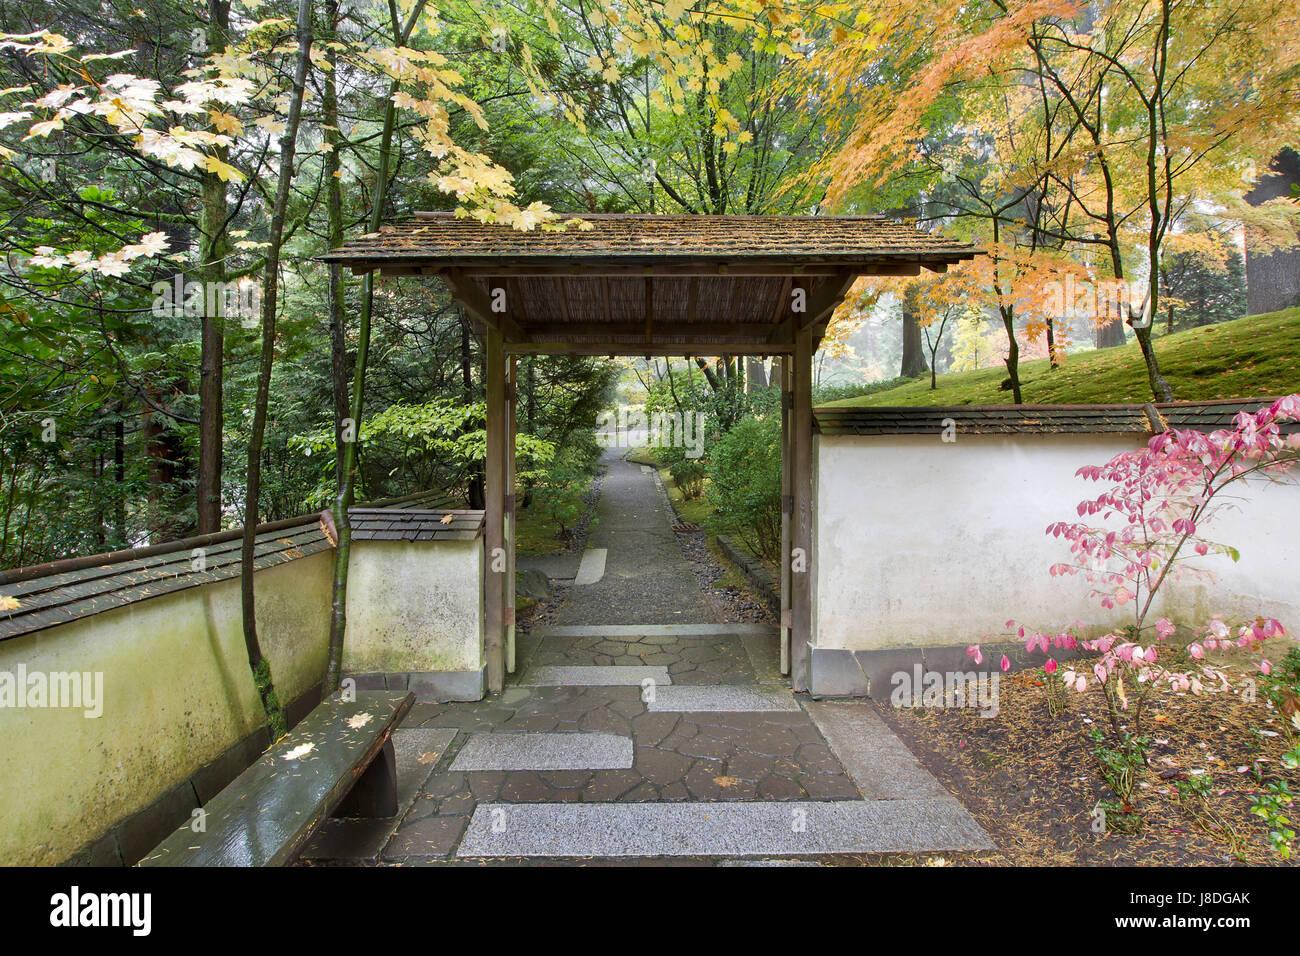 Garden, Stone, Goal, Passage, Gate, Archgway, Gantry, Japanese, Walkway,  Seat,